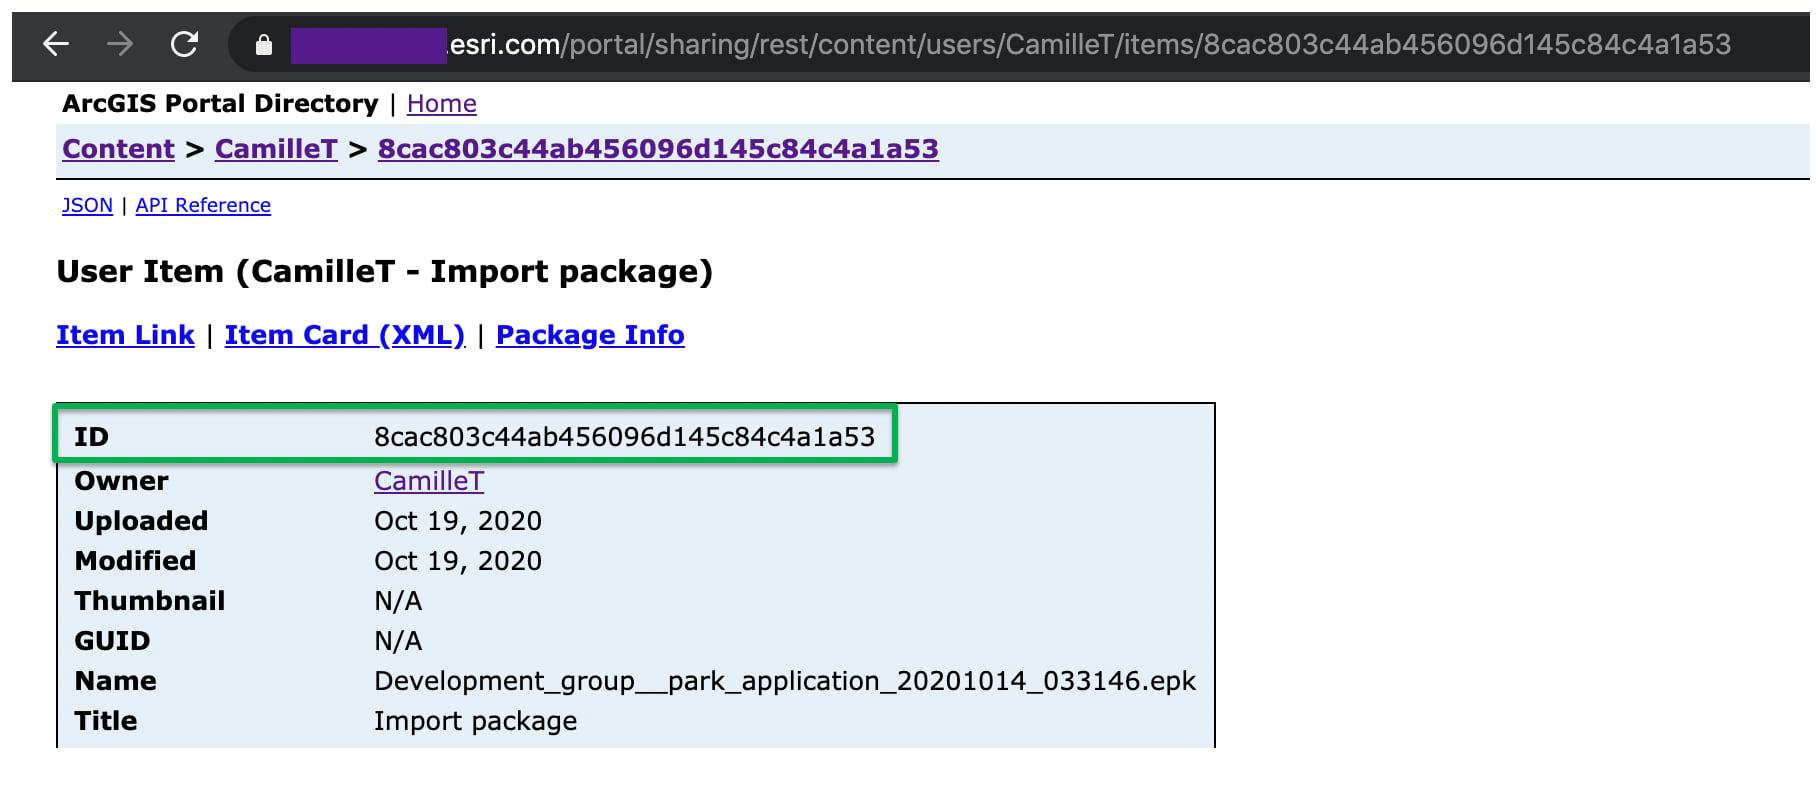 Capture item ID in the REST API